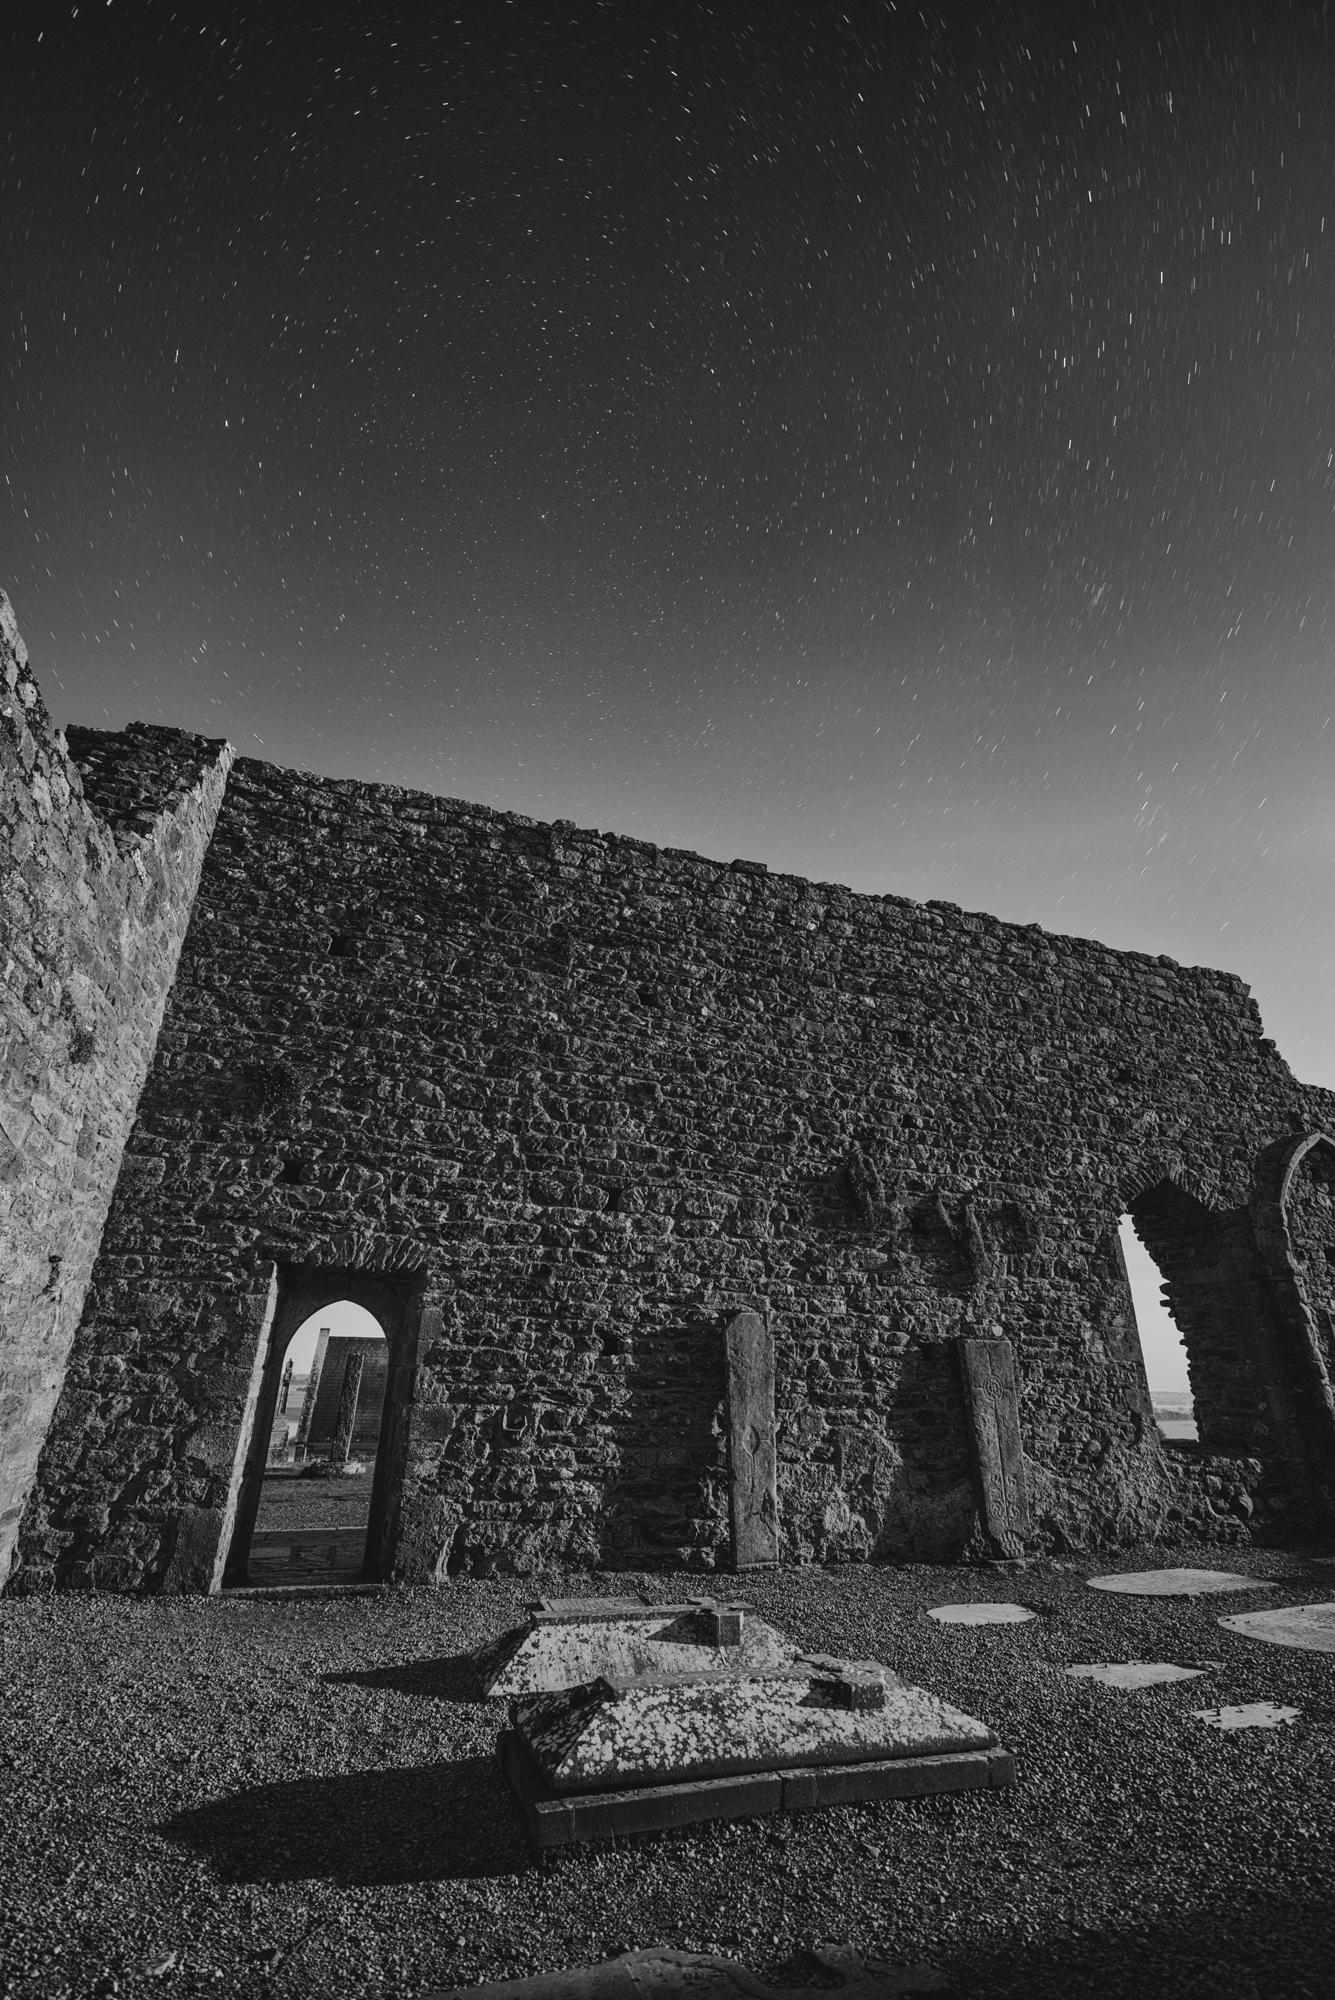 Clonmacnoise Monastery night photography Ireland